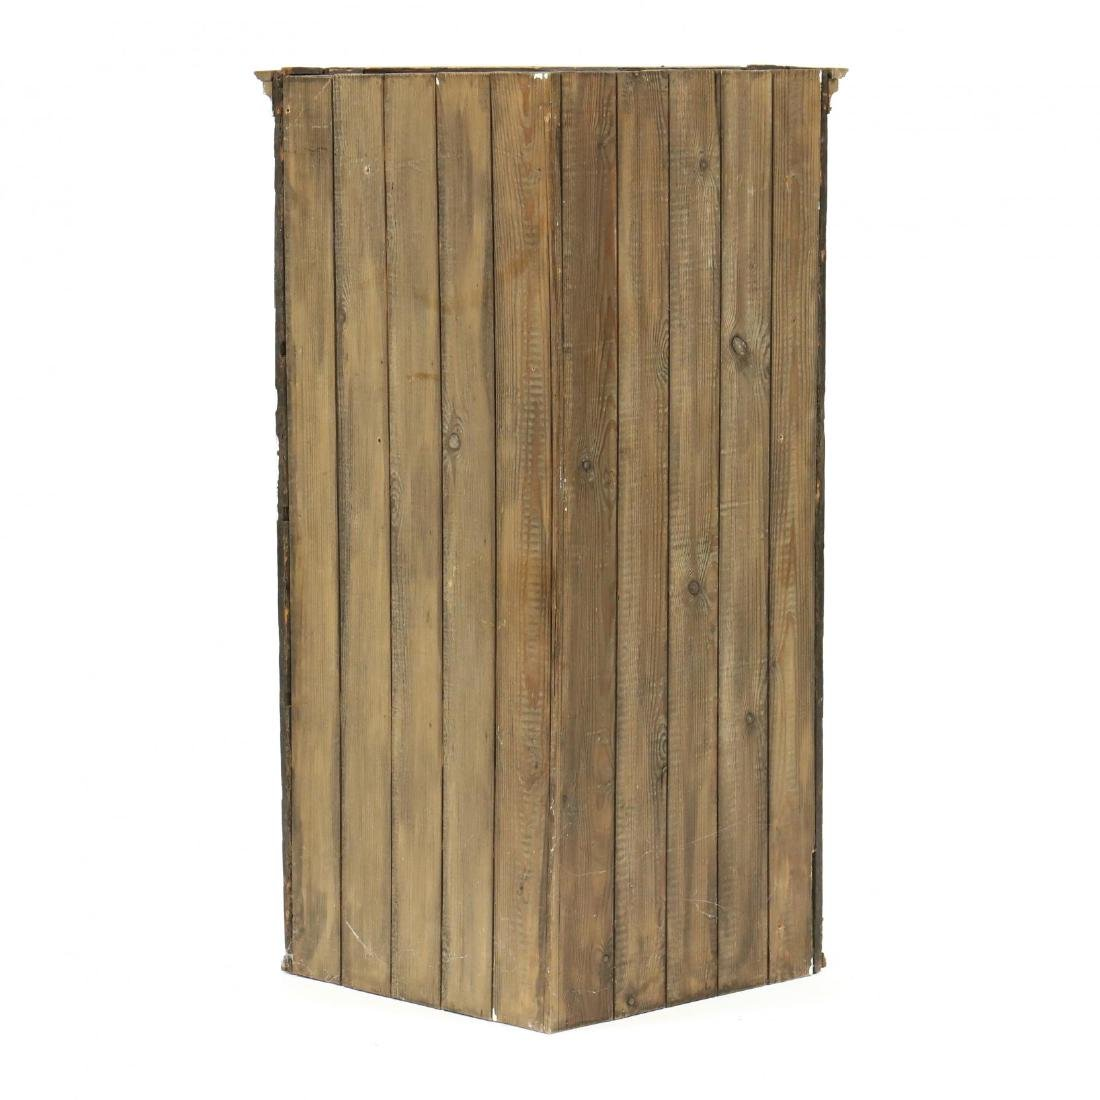 Edwardian Oak Hanging Corner Cabinet - 2